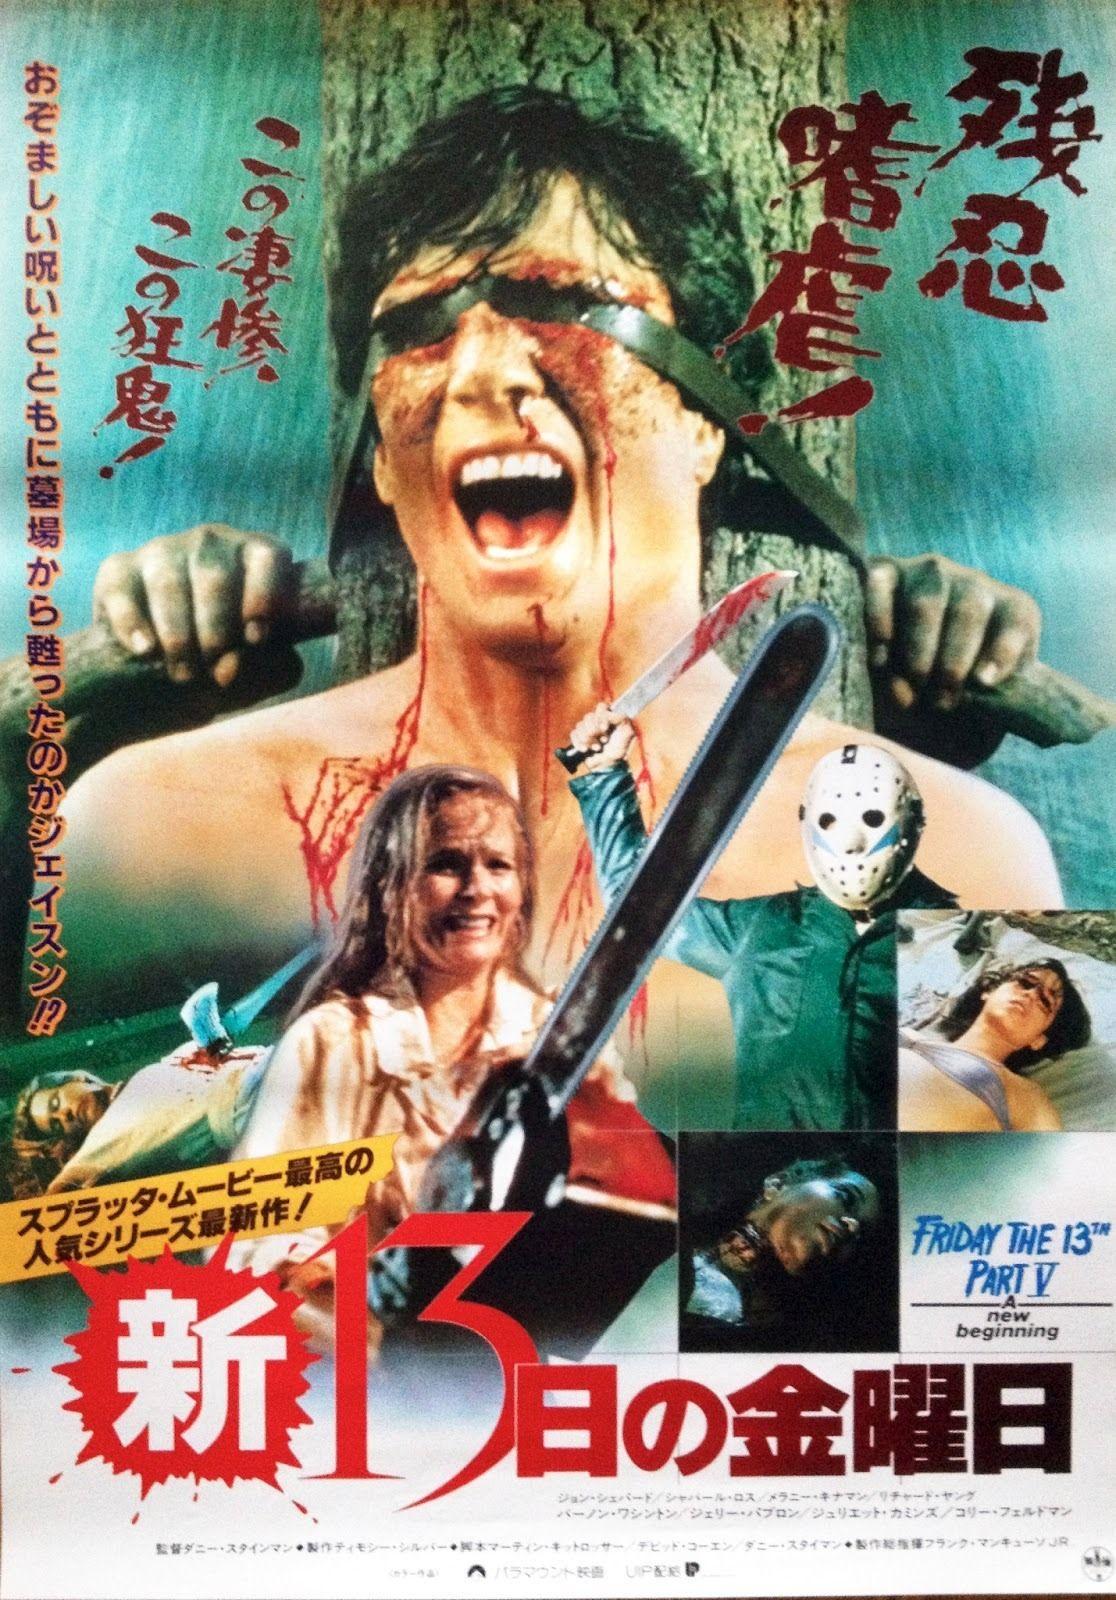 A New Beginning Japanese poster